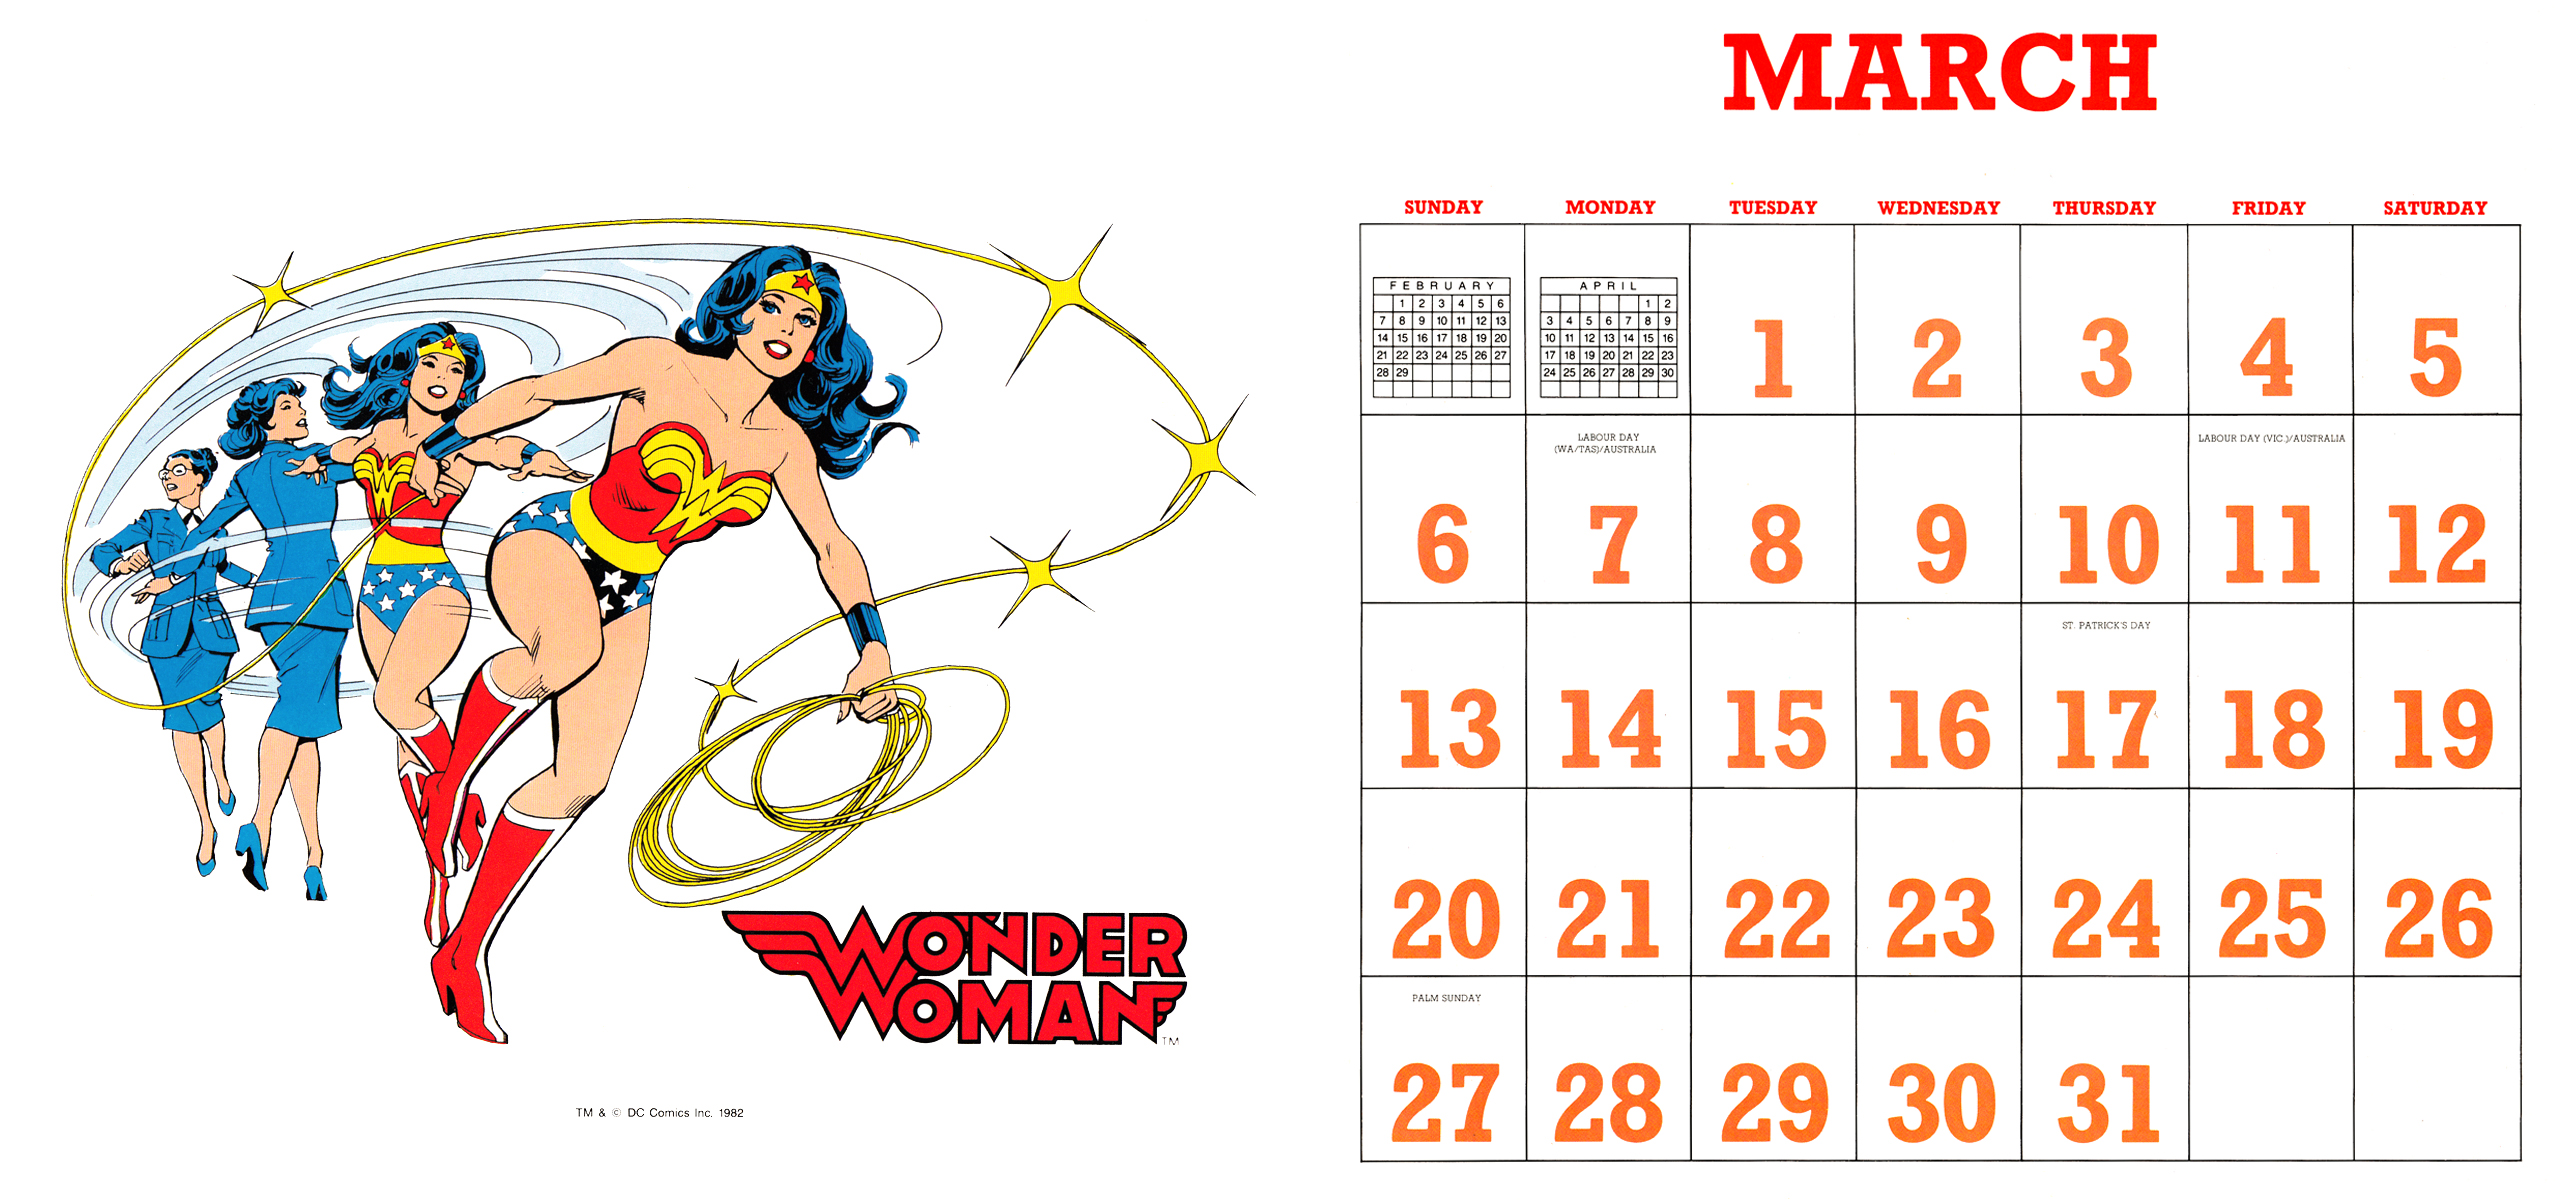 DC Super Powers 19882016 Wallpaper Calendar   Andertoons Cartoon Blog 2560x1200